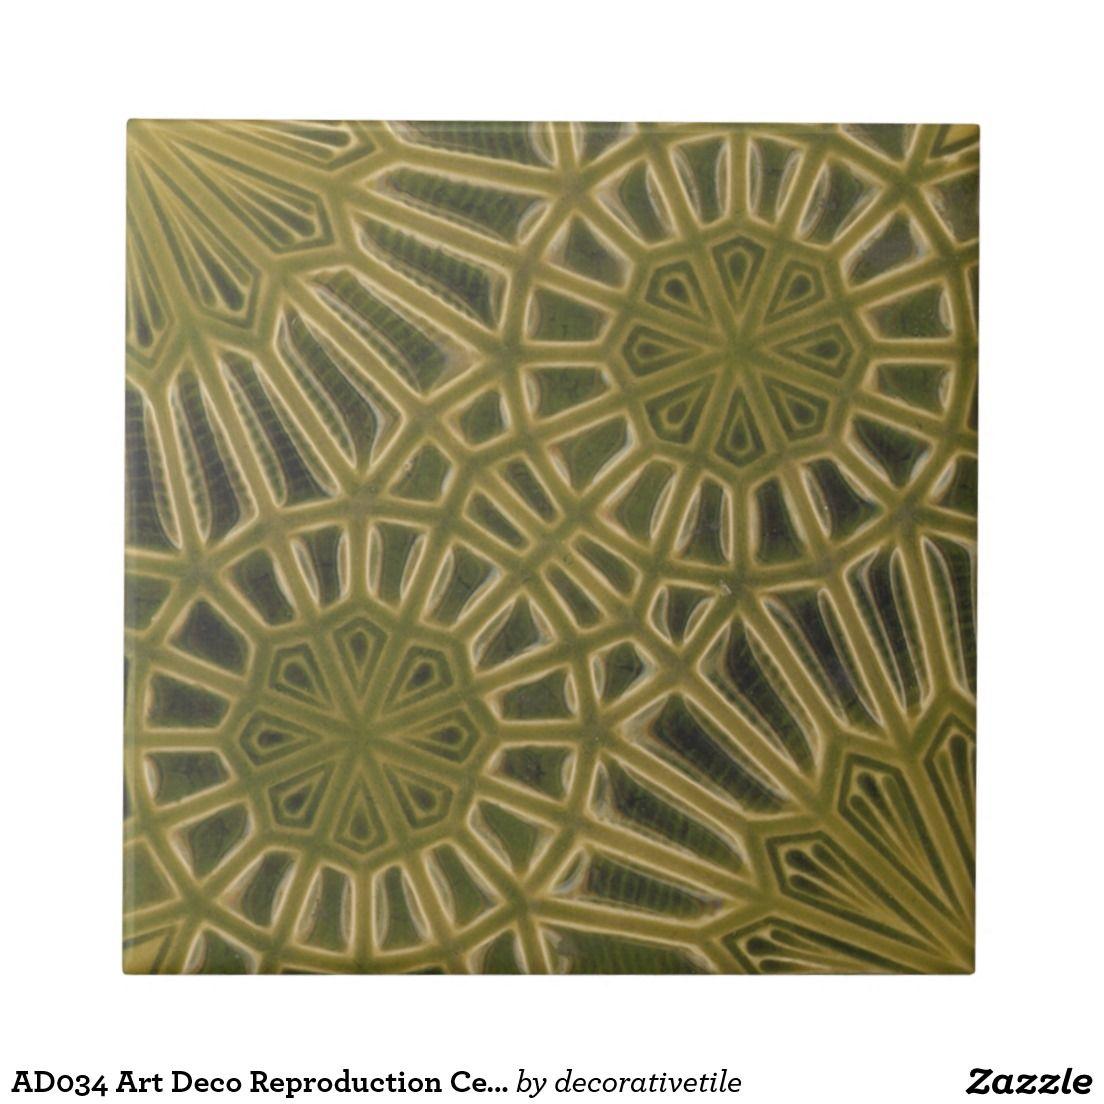 Ad034 art deco reproduction ceramic tile art deco ad034 art deco reproduction ceramic tile dailygadgetfo Images